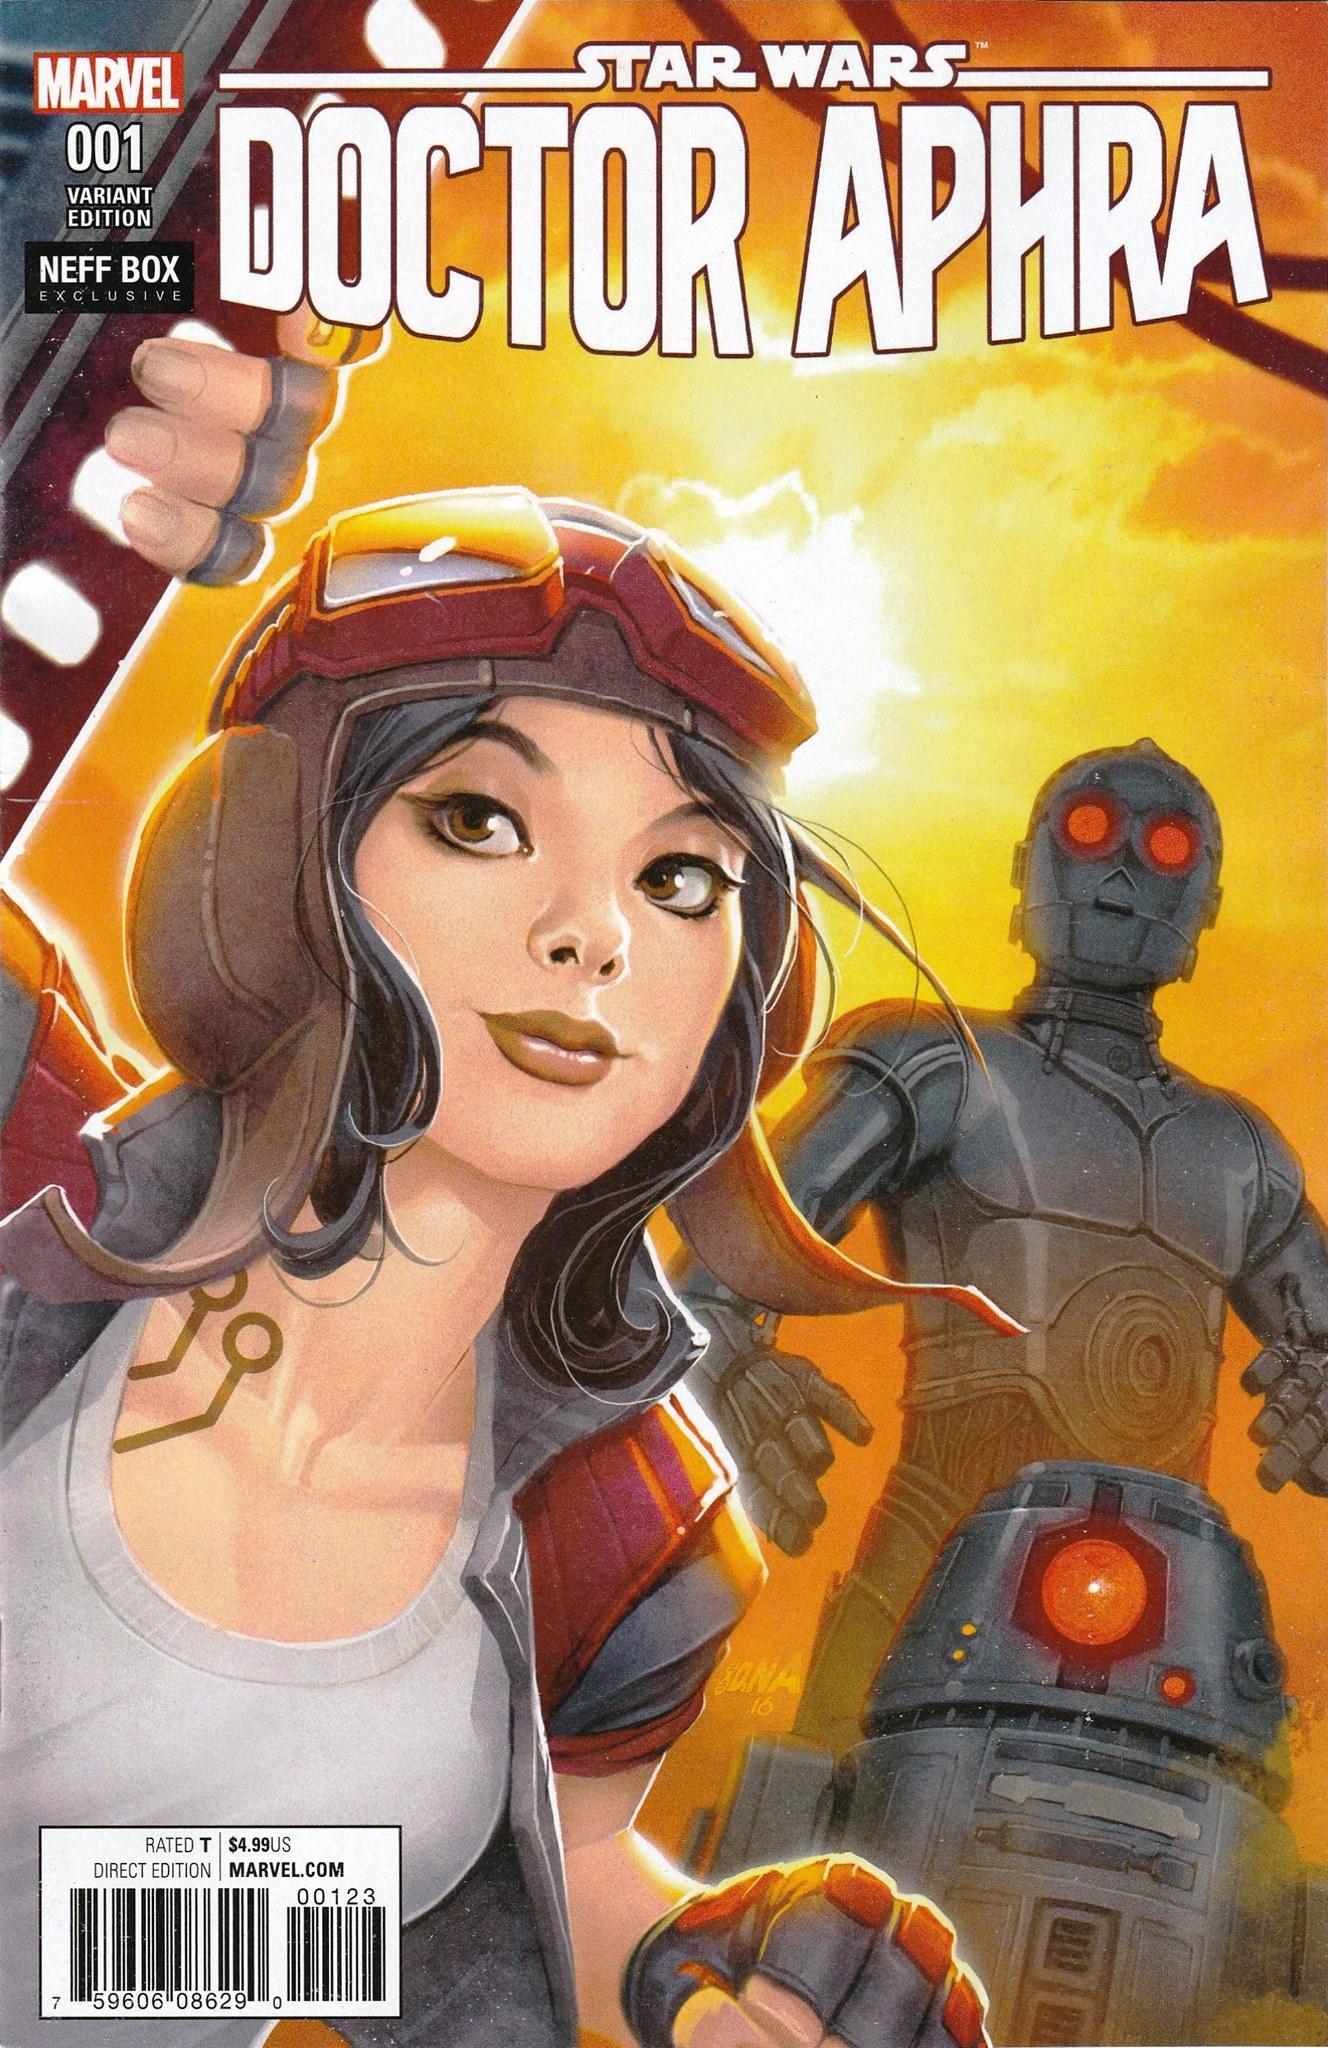 Doctor Aphra #1 (David Nakayama NEFF Box Variant Cover) (07.12.2016)